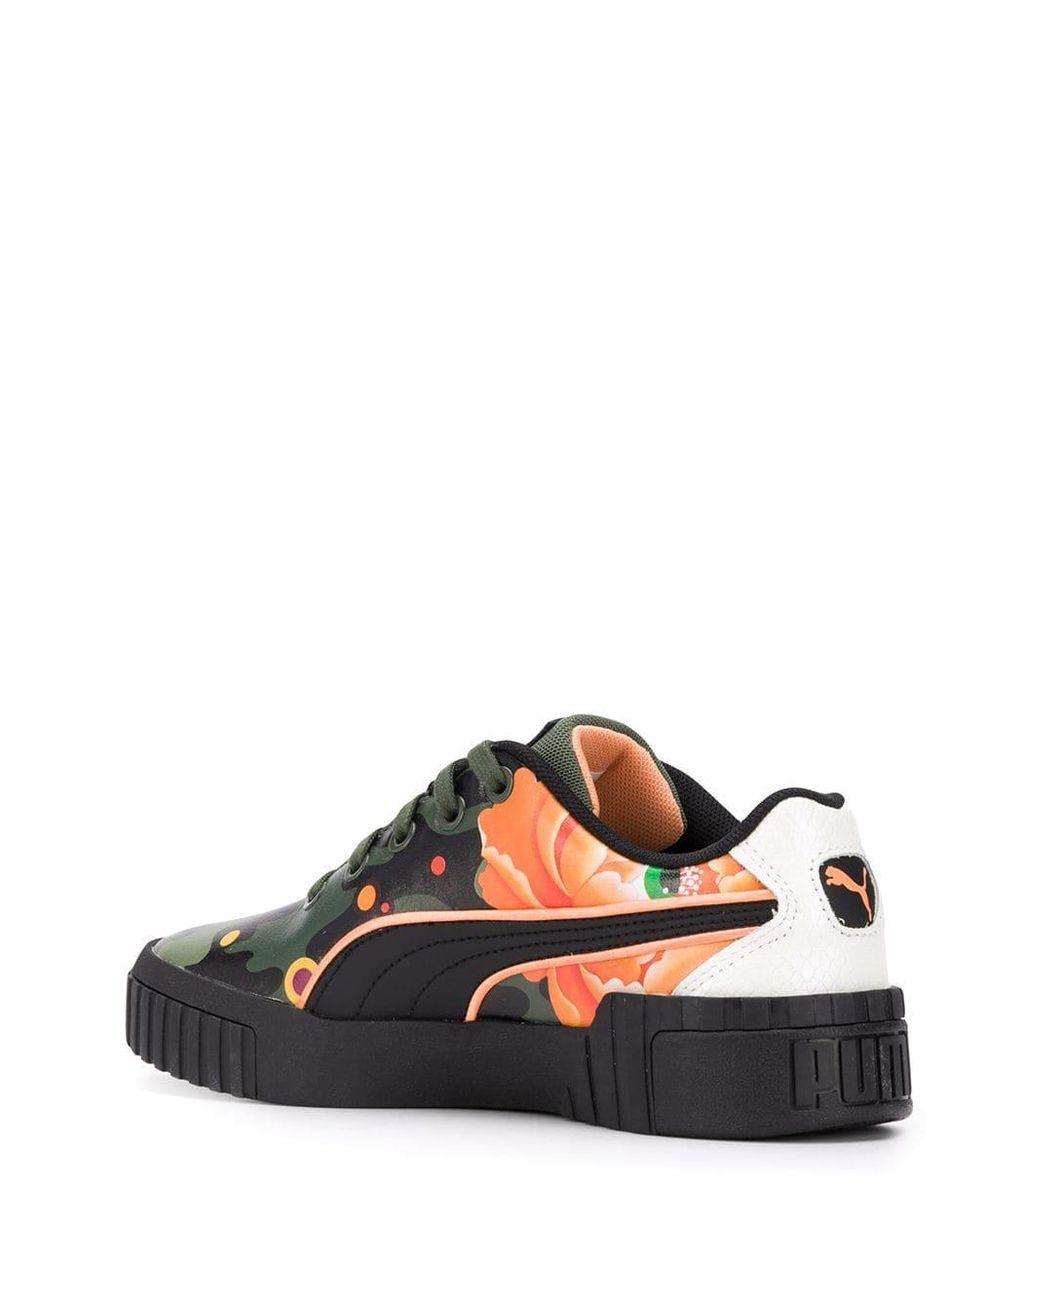 c16bcedf4d1 PUMA X Sue Tsai Cali Peonies Camo Sneakers in Black - Lyst